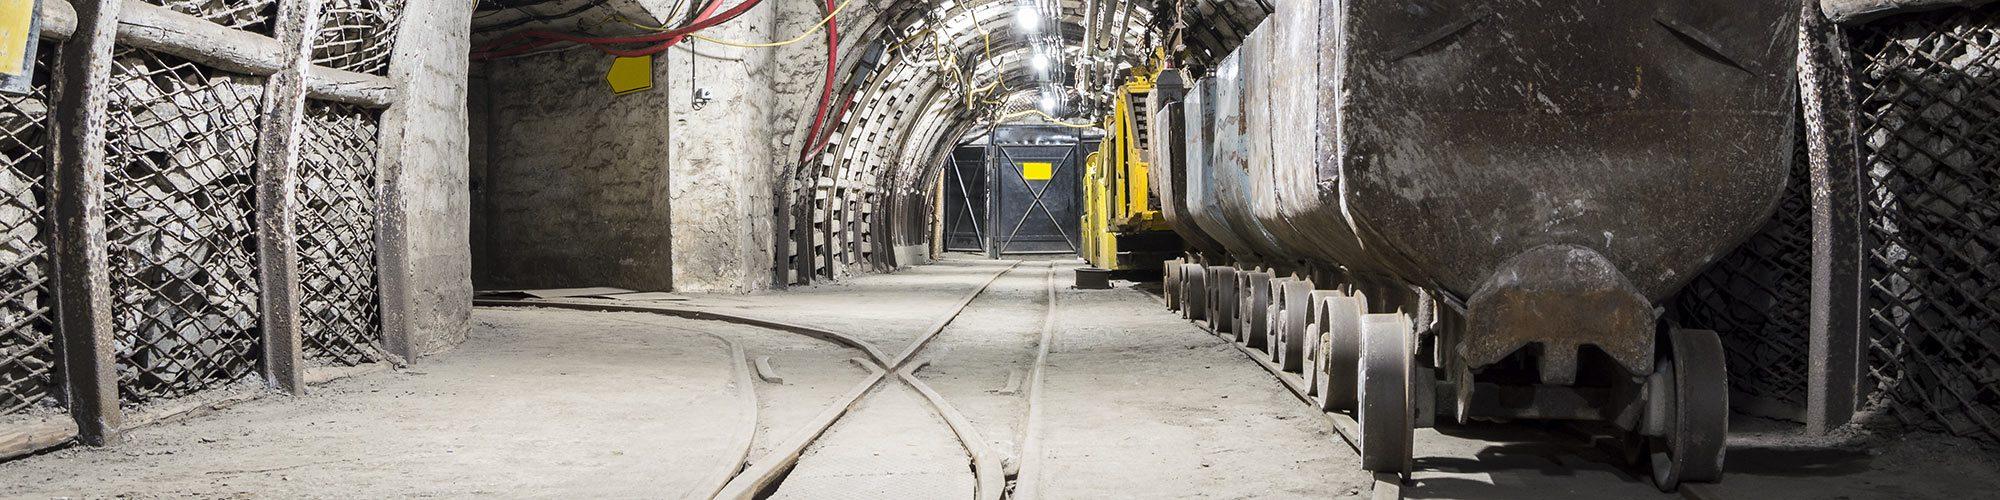 Ensuring electrical safety in underground mining